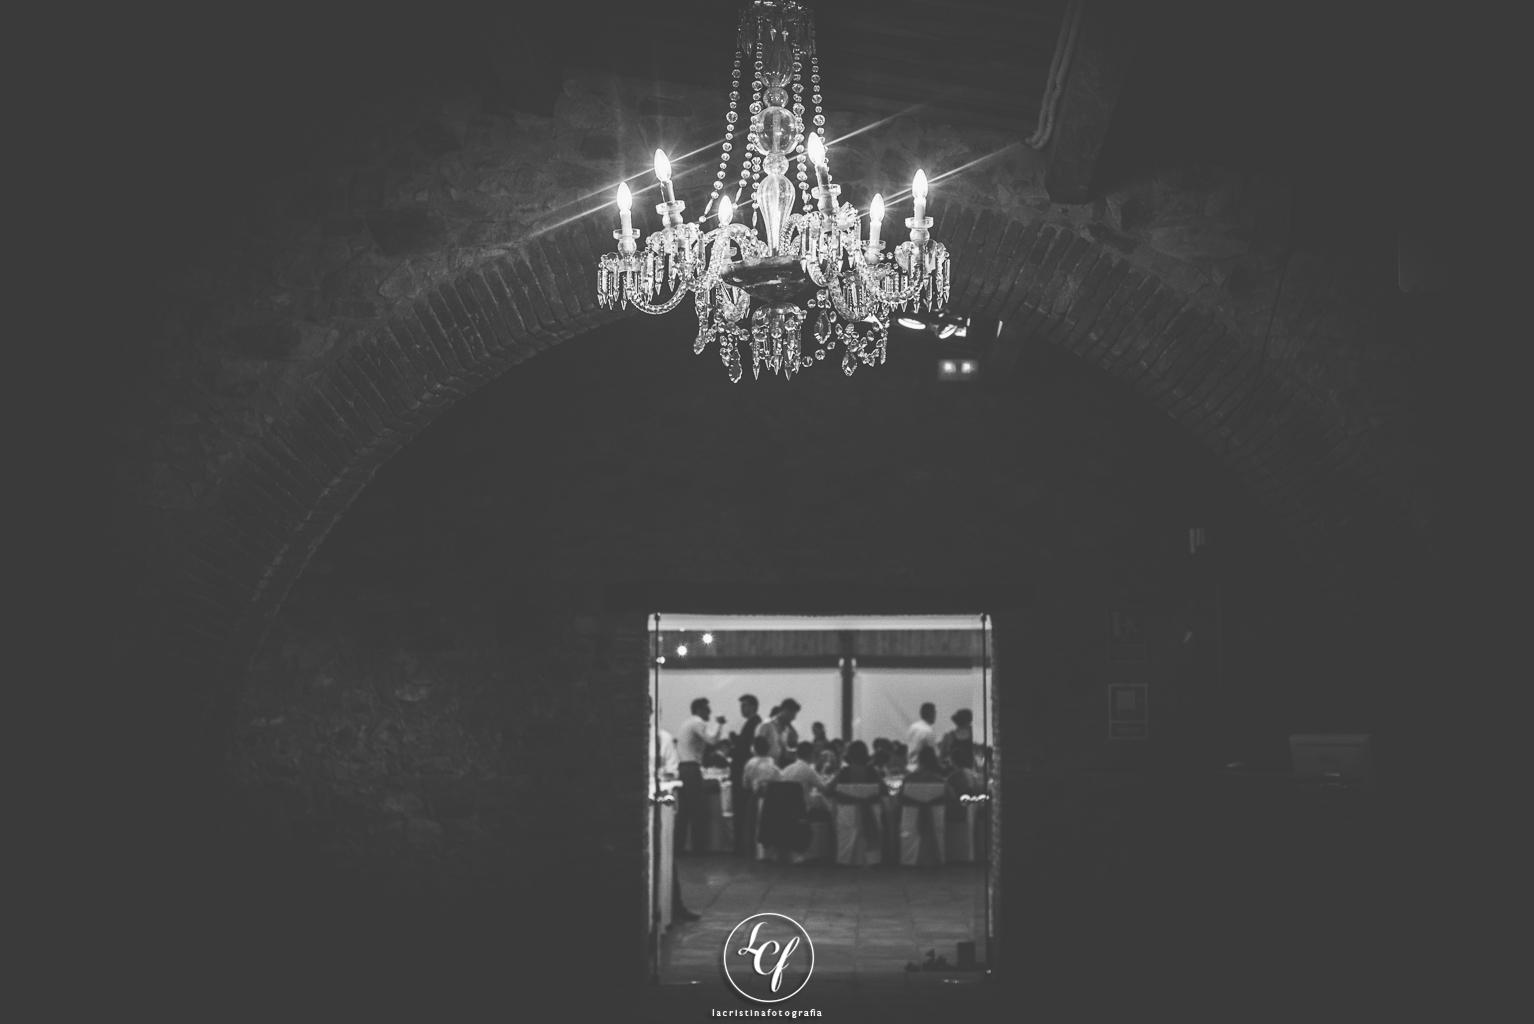 fotógrafo de bodas :: mas cánovas :: bodas en el bosque :: bodas en una masia :: bodas en el campo :: bodas con encanto